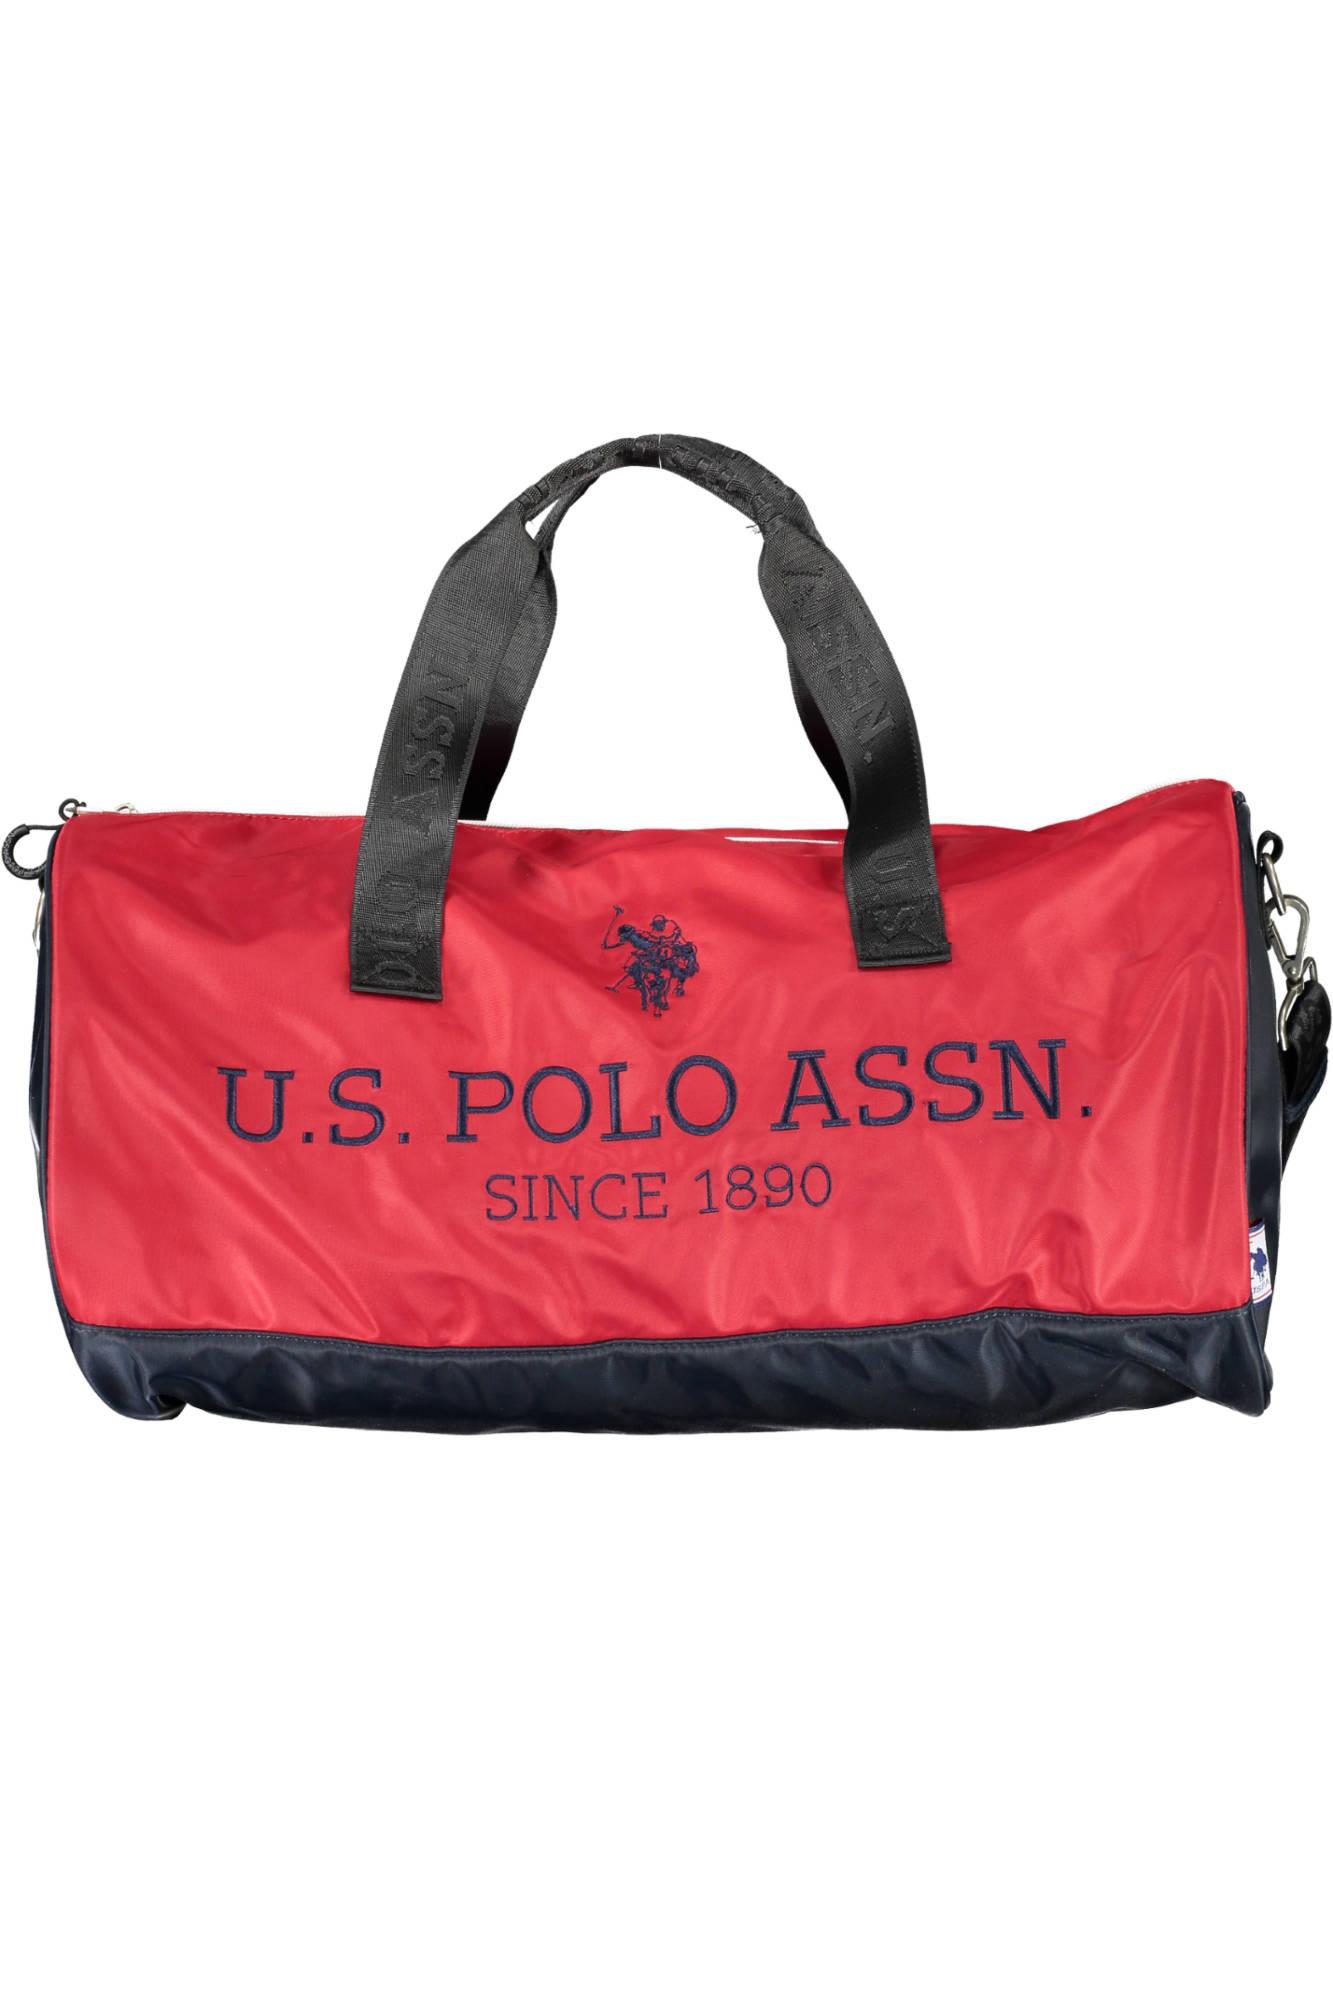 U.S. POLO ASSN. taška do ruky ROSSO